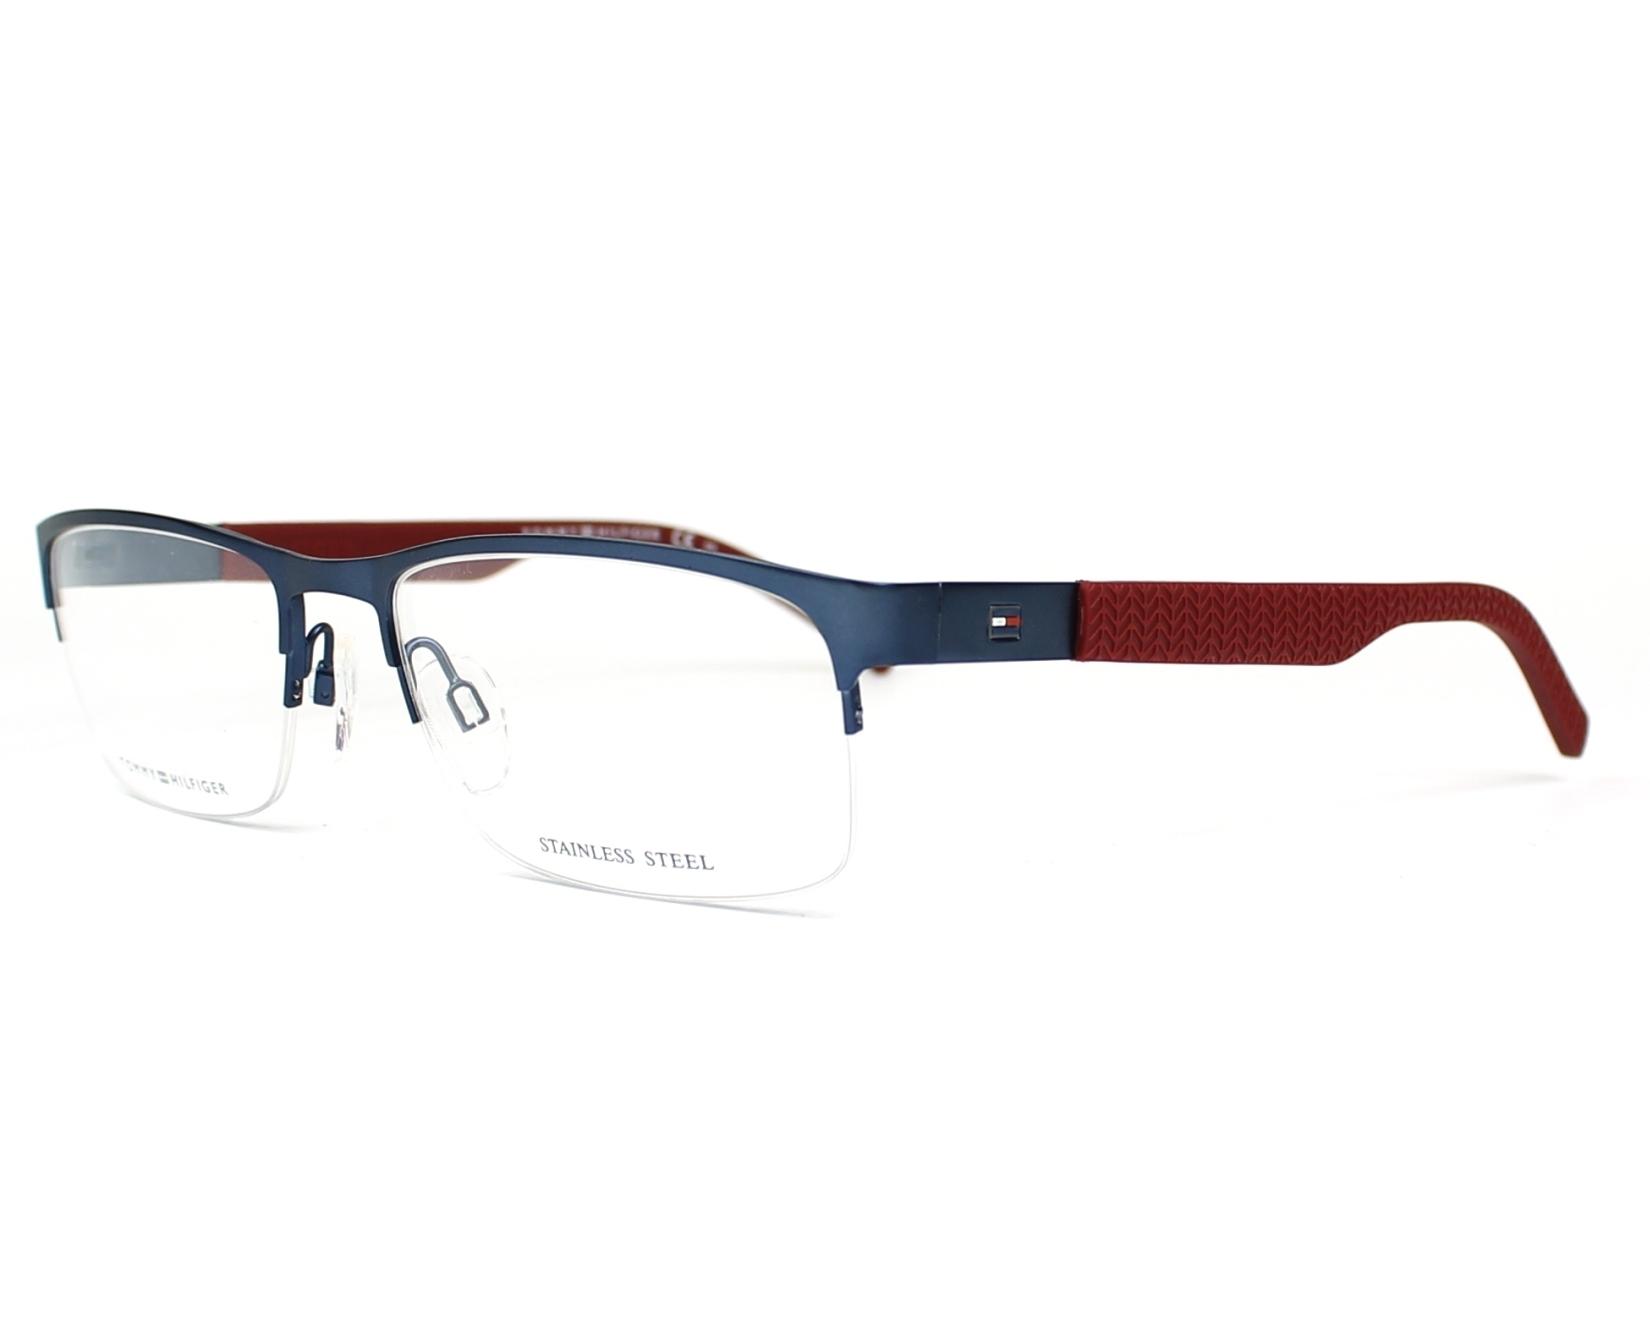 eyeglasses Tommy Hilfiger TH-1447 LL0 55-18 Blue Bordeaux profile view